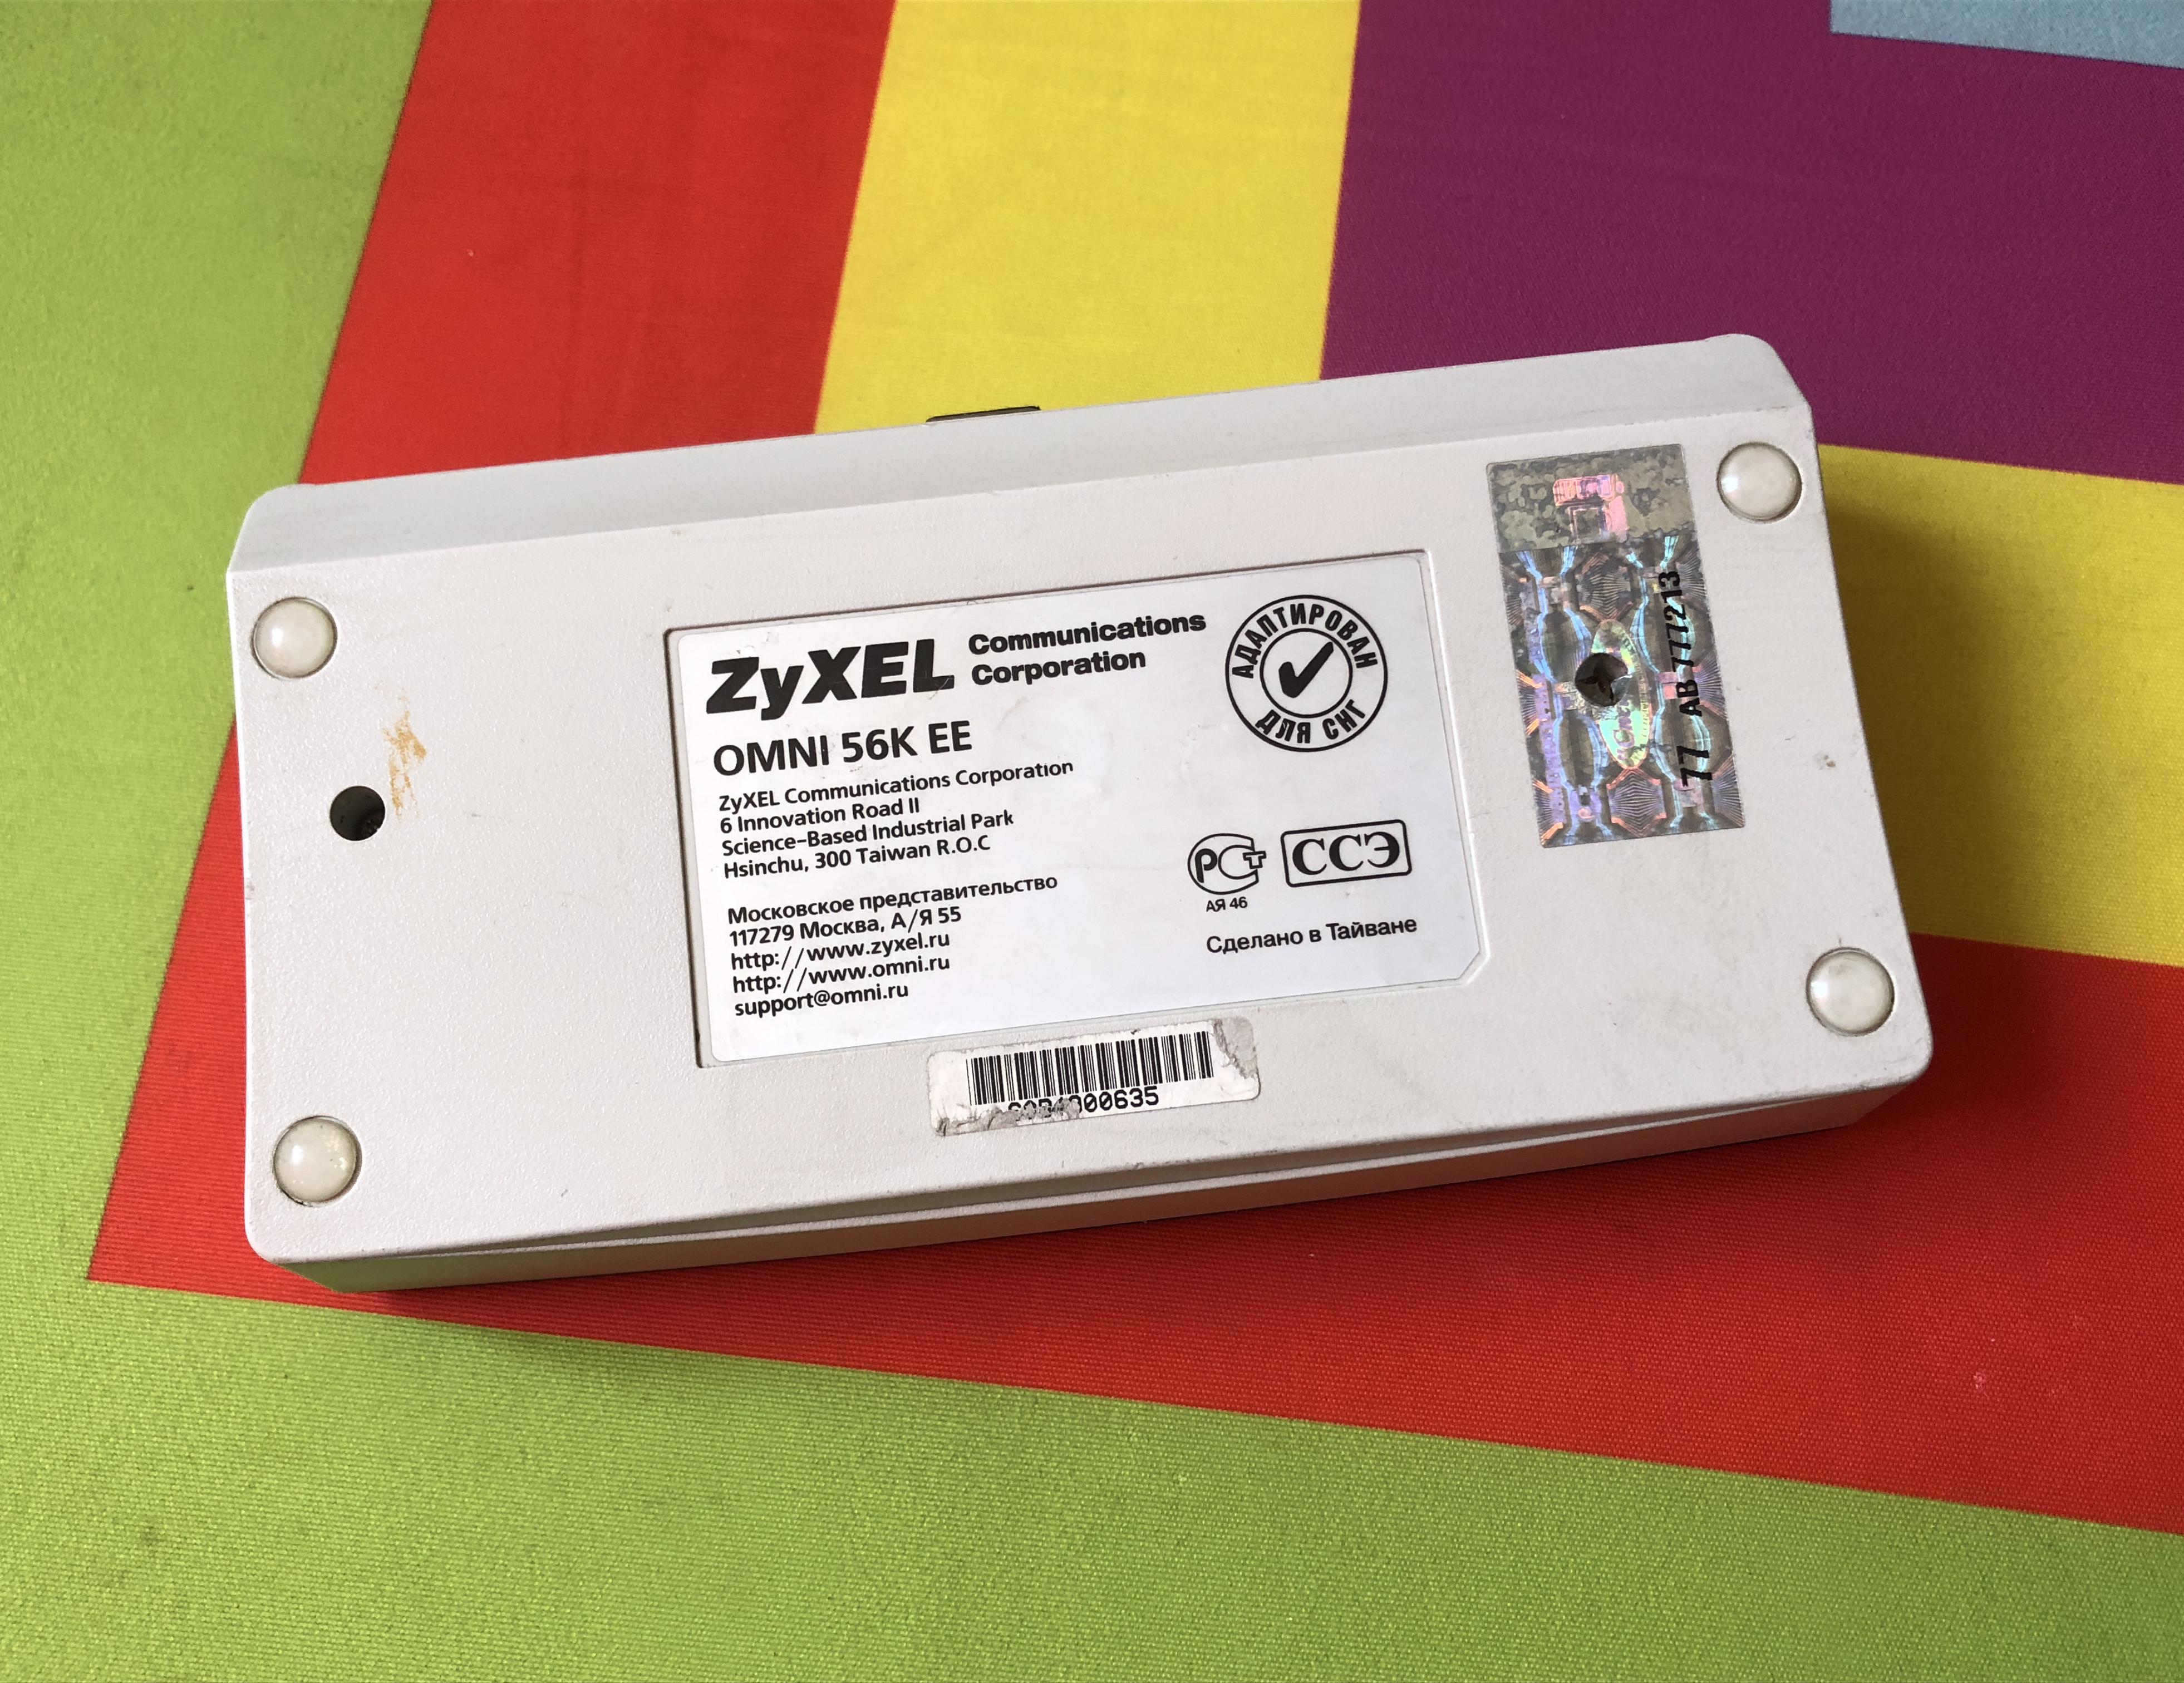 modem-1-2.jpg